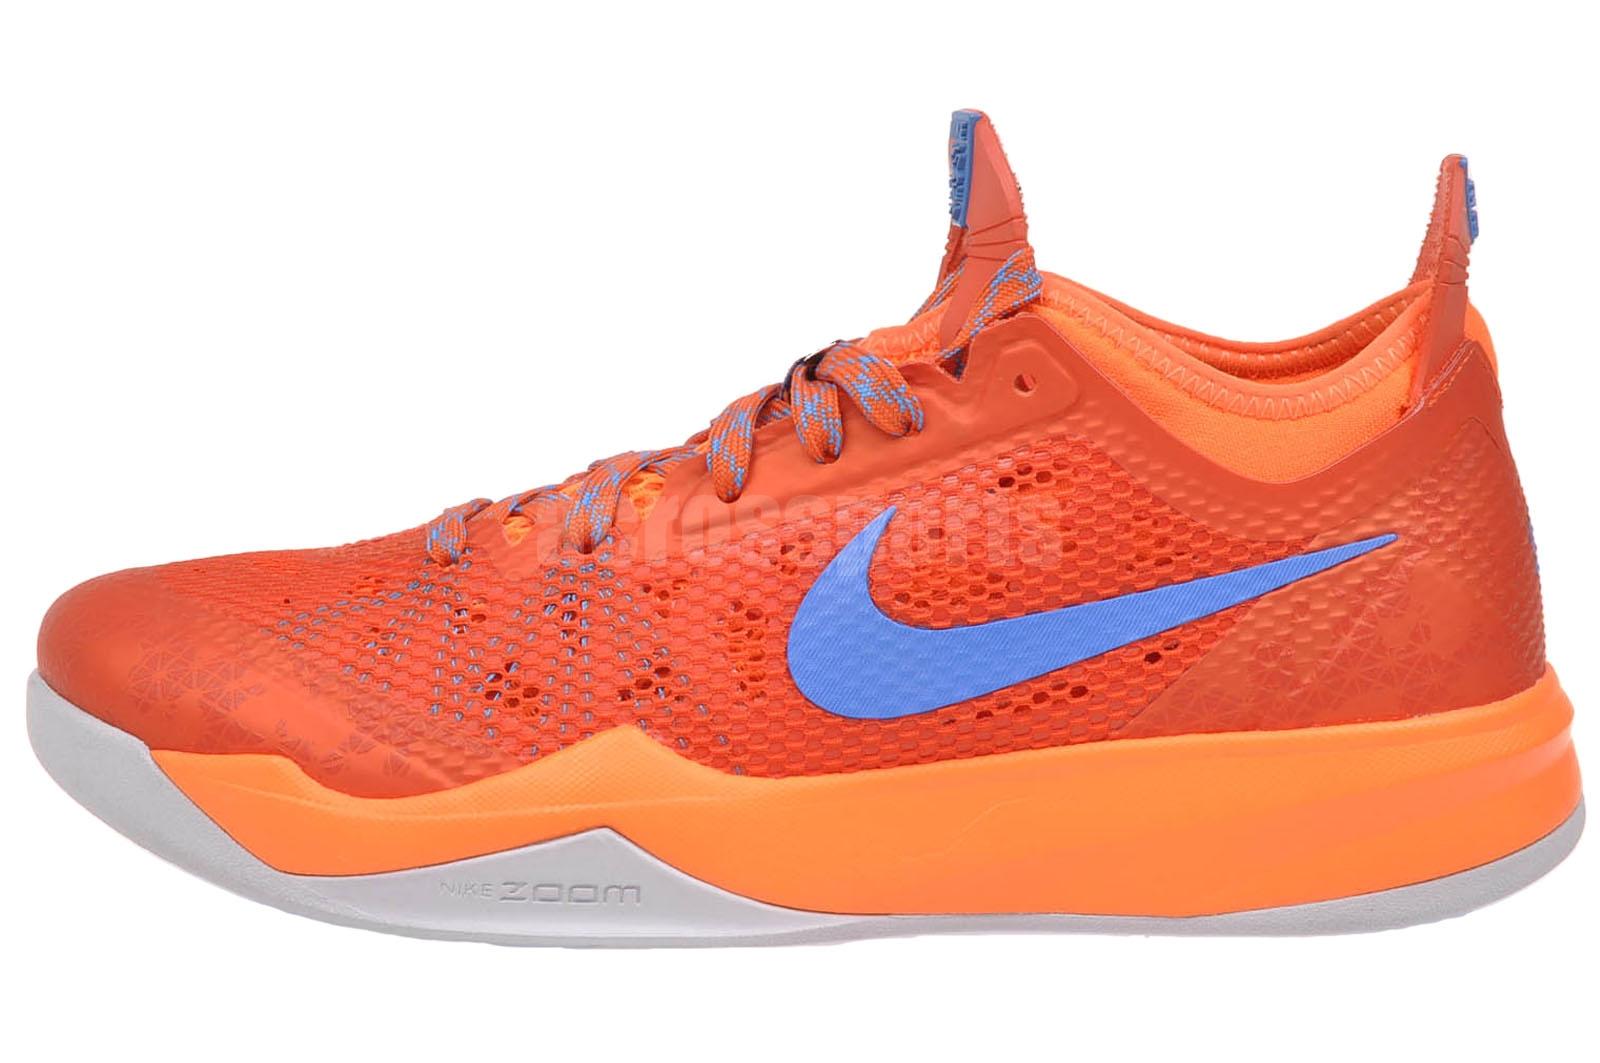 Nike Zoom Crusader Outdoor Mens 2014 Basketball Shoes ...